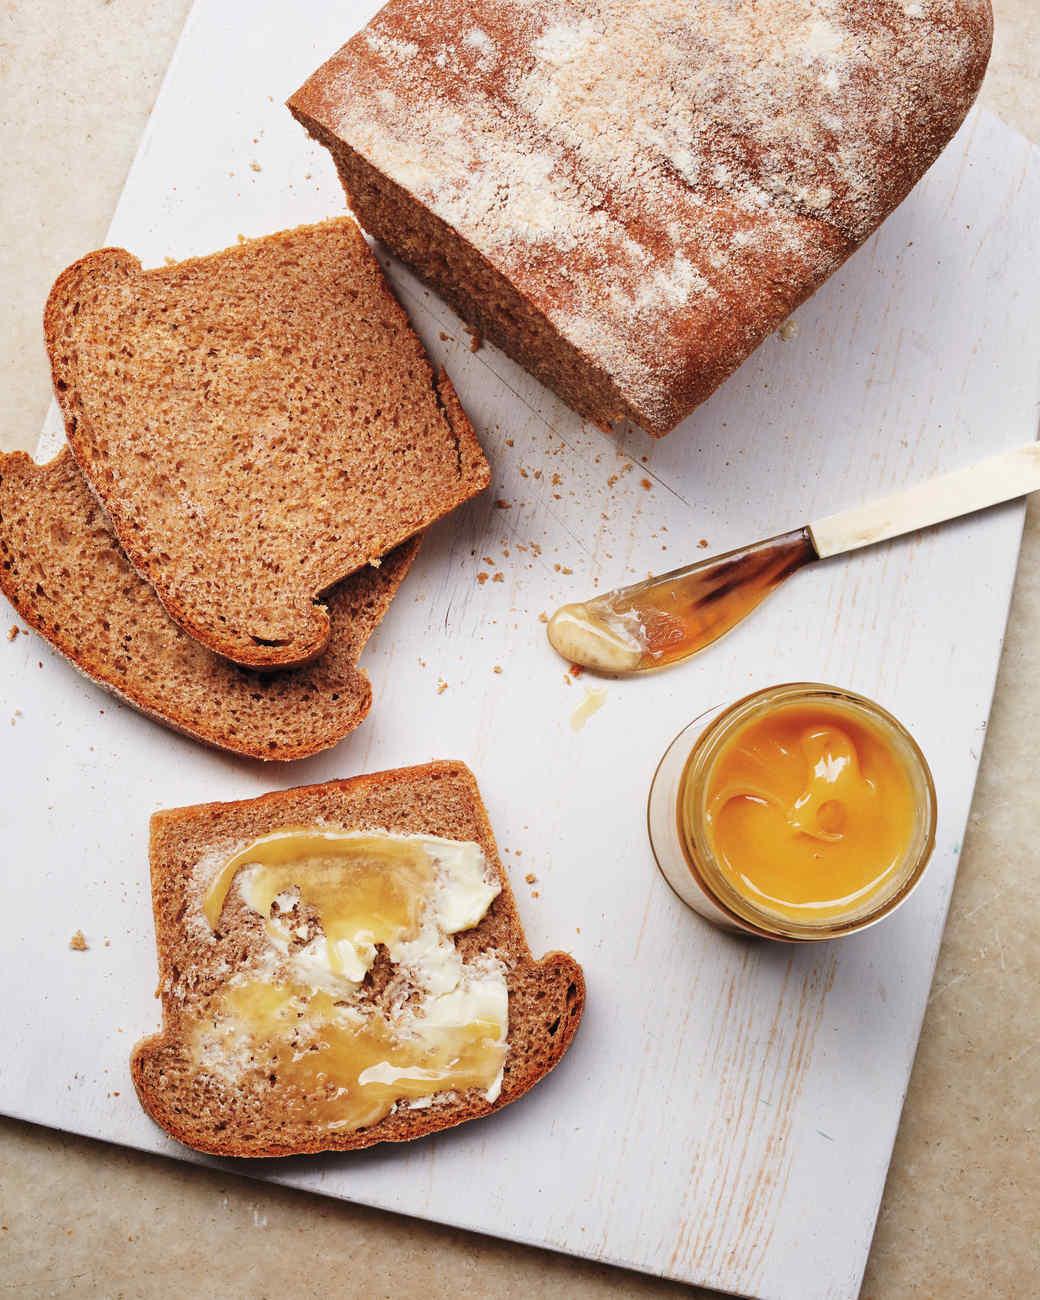 hayden-flour-mills-honey-loaf-bread-d112232-820-d112232.jpg